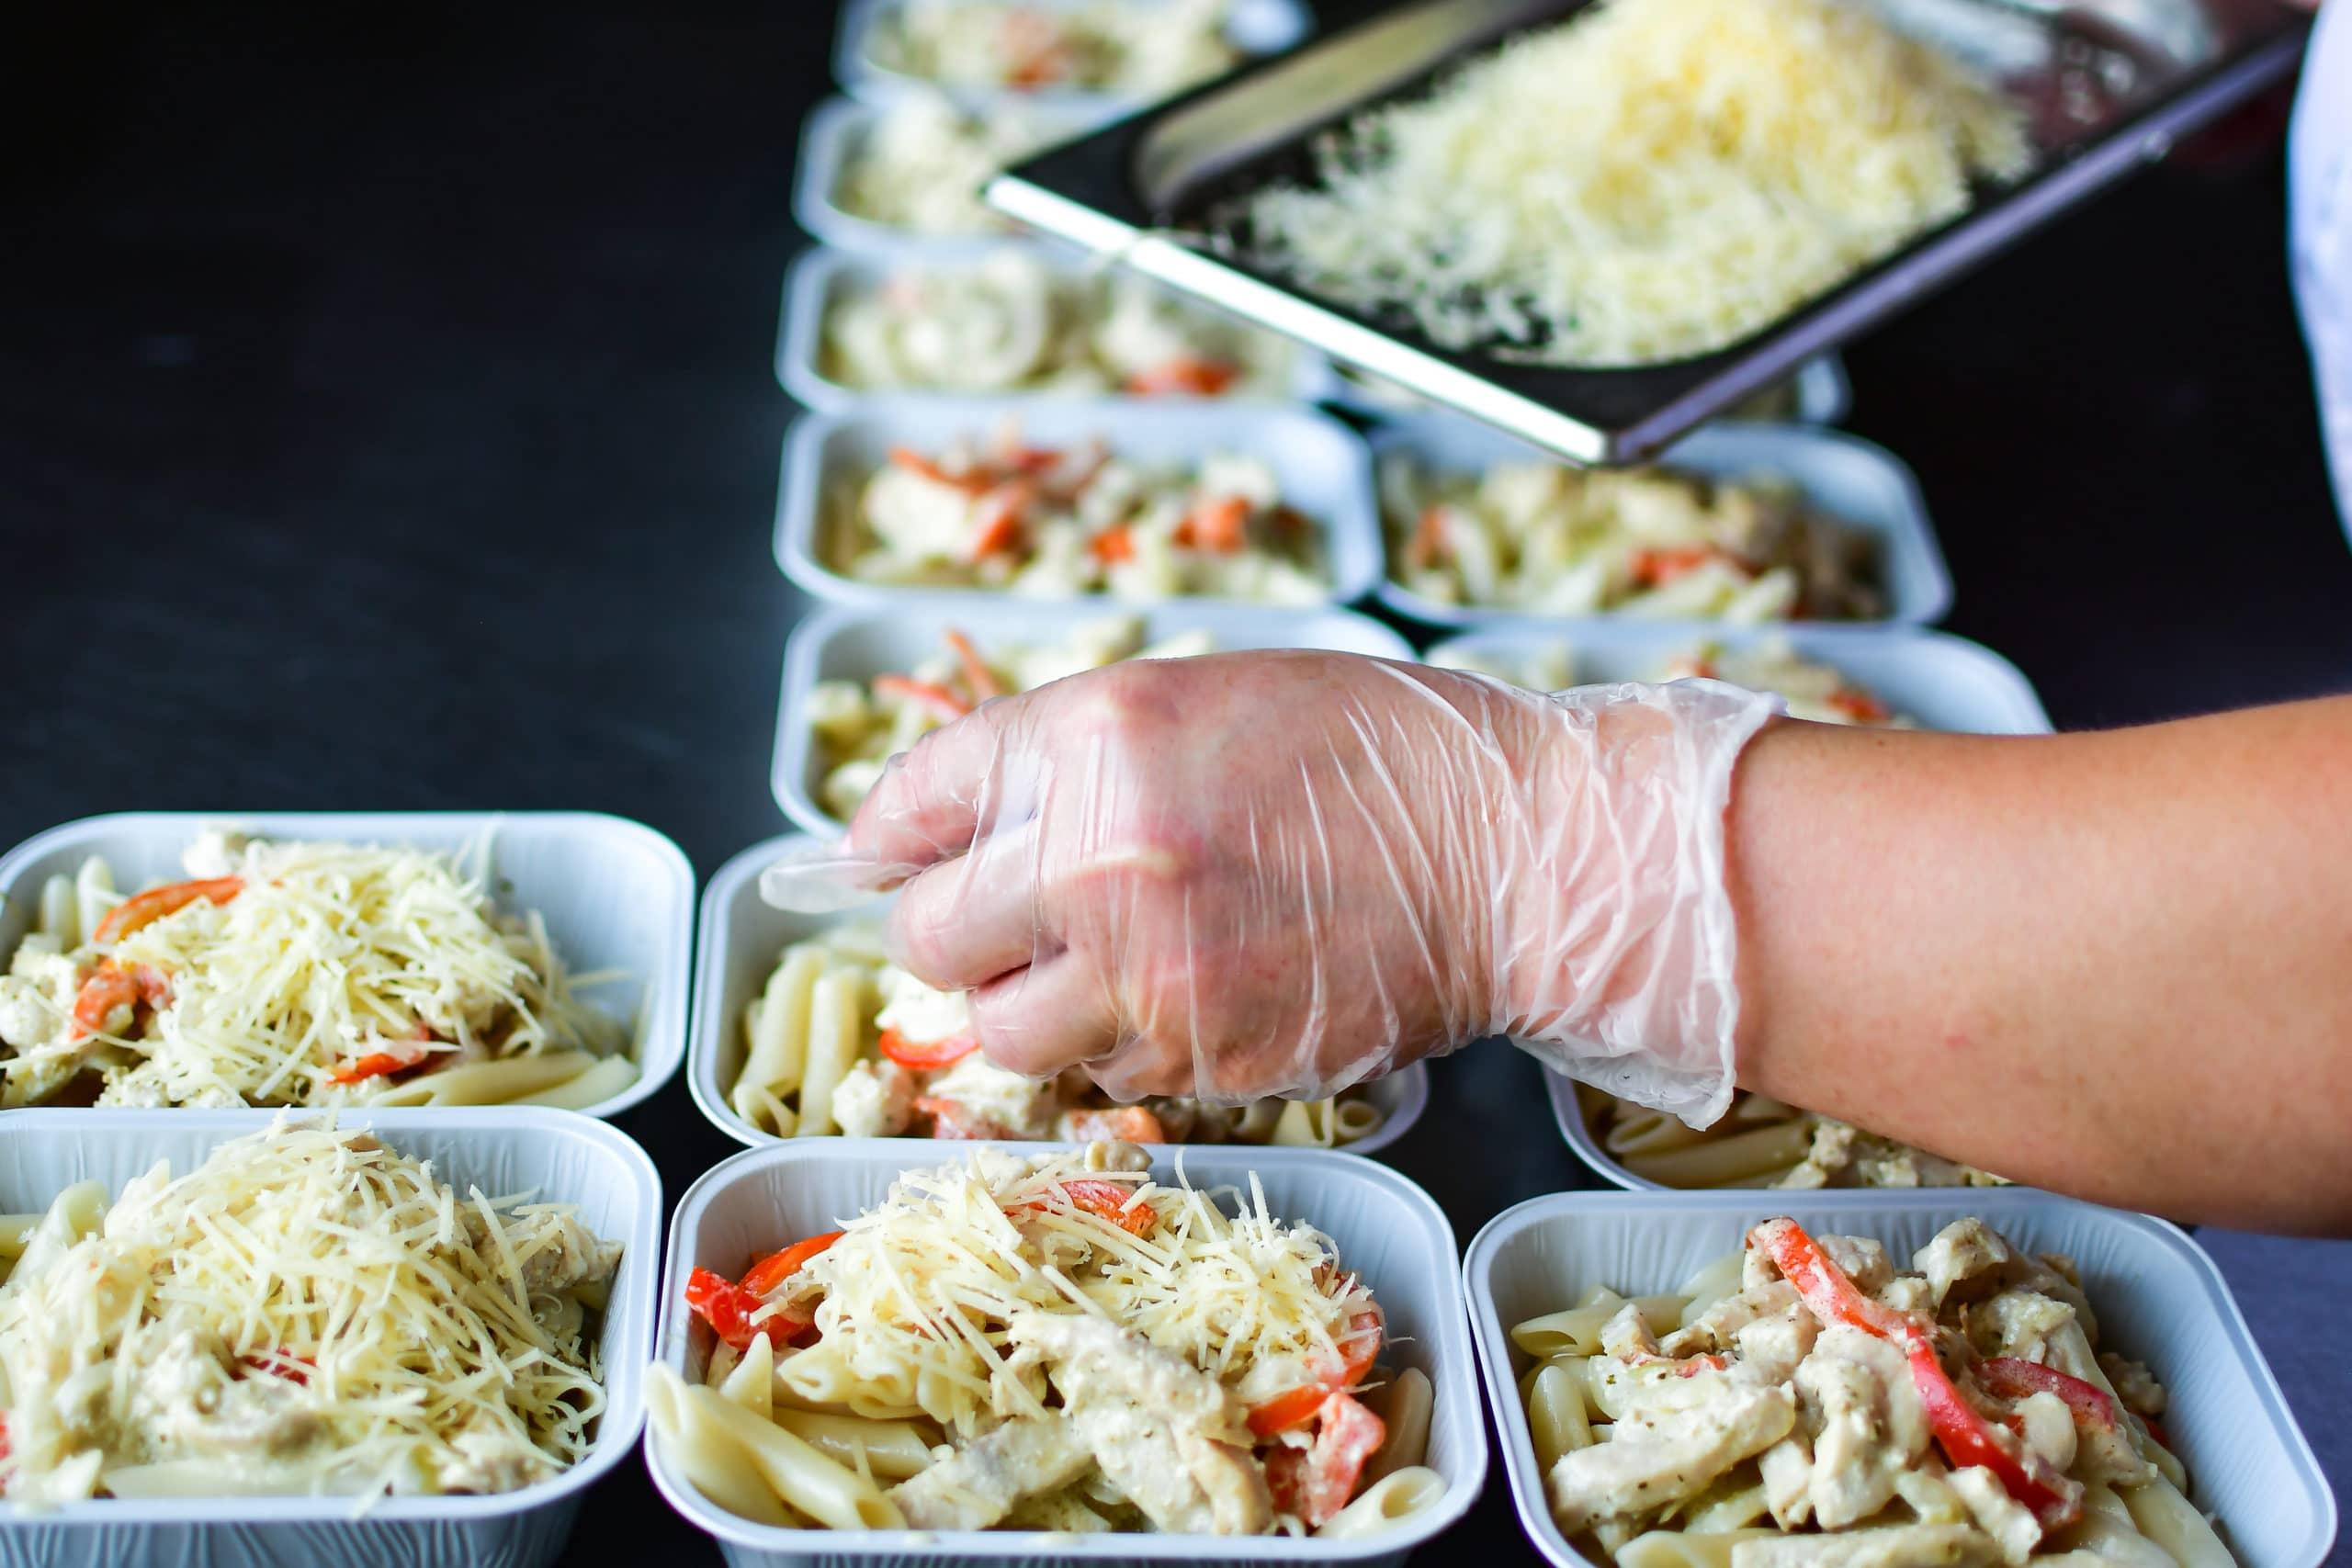 Hand preparing large order of take out pasta